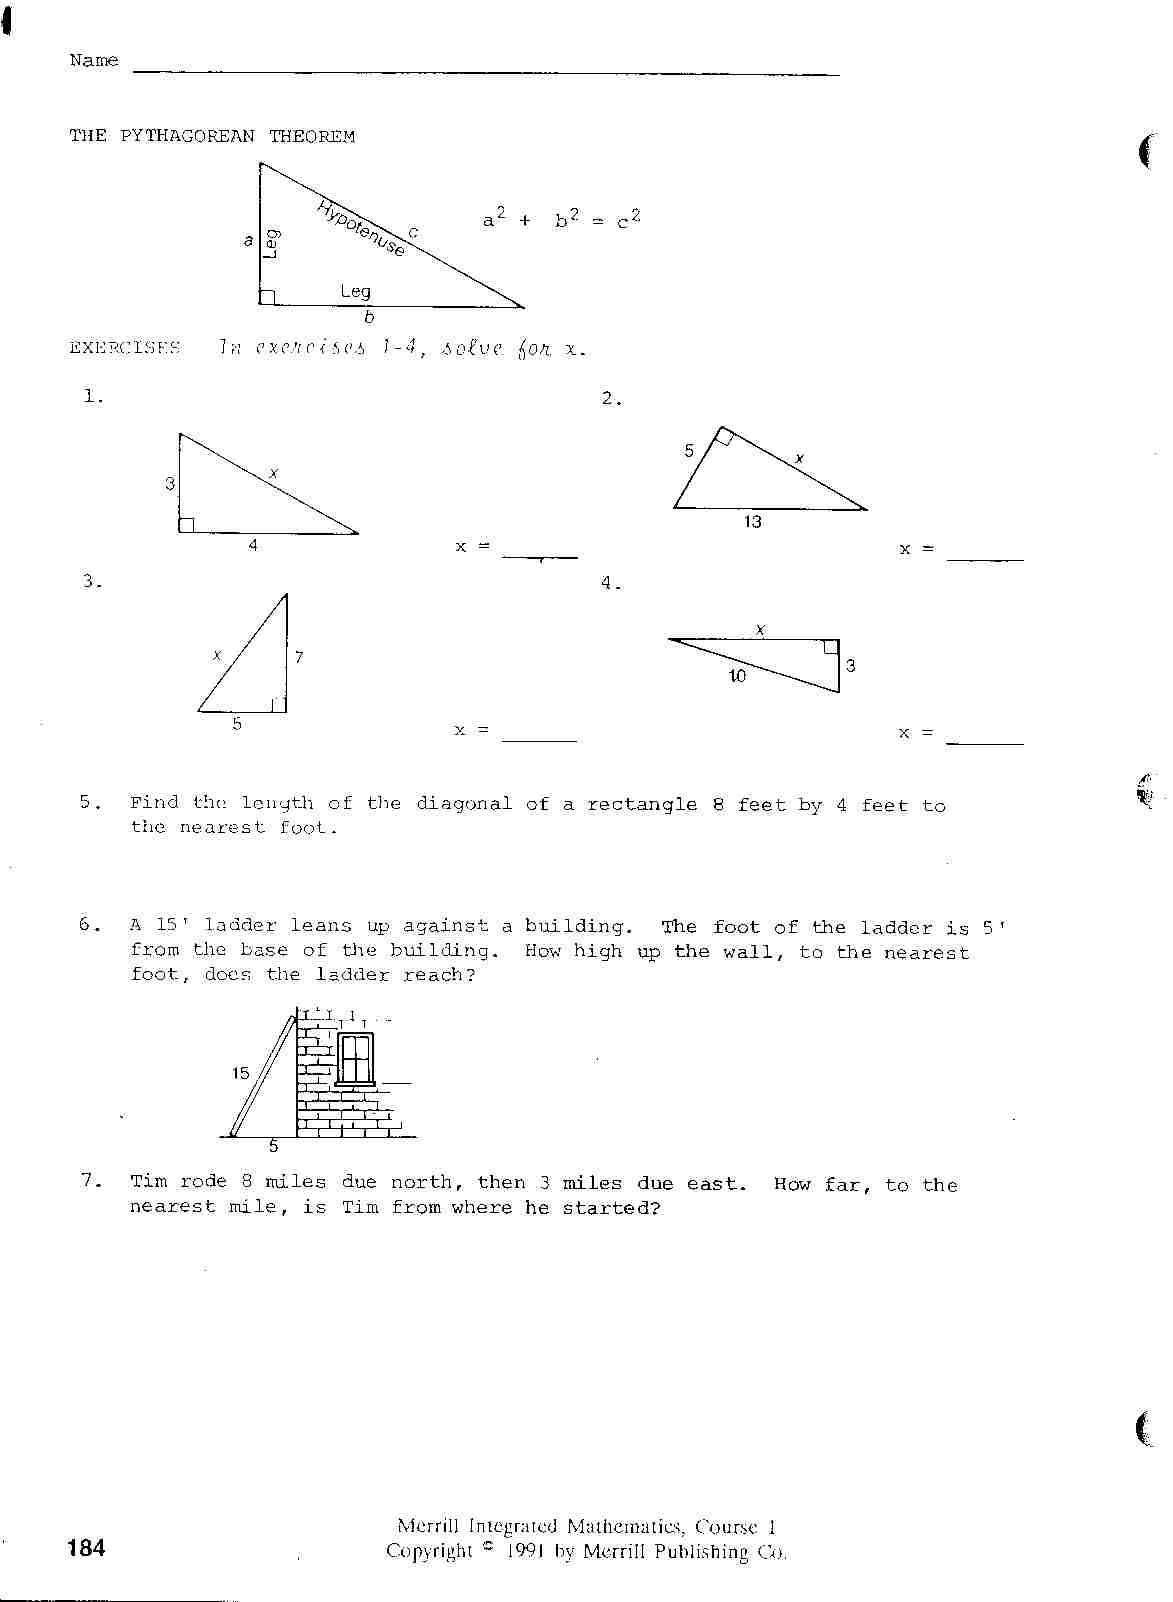 Worksheets Integrated Math 1 Worksheets worksheet integrated math 2 worksheets mytourvn study site mt baker student observation project page 2